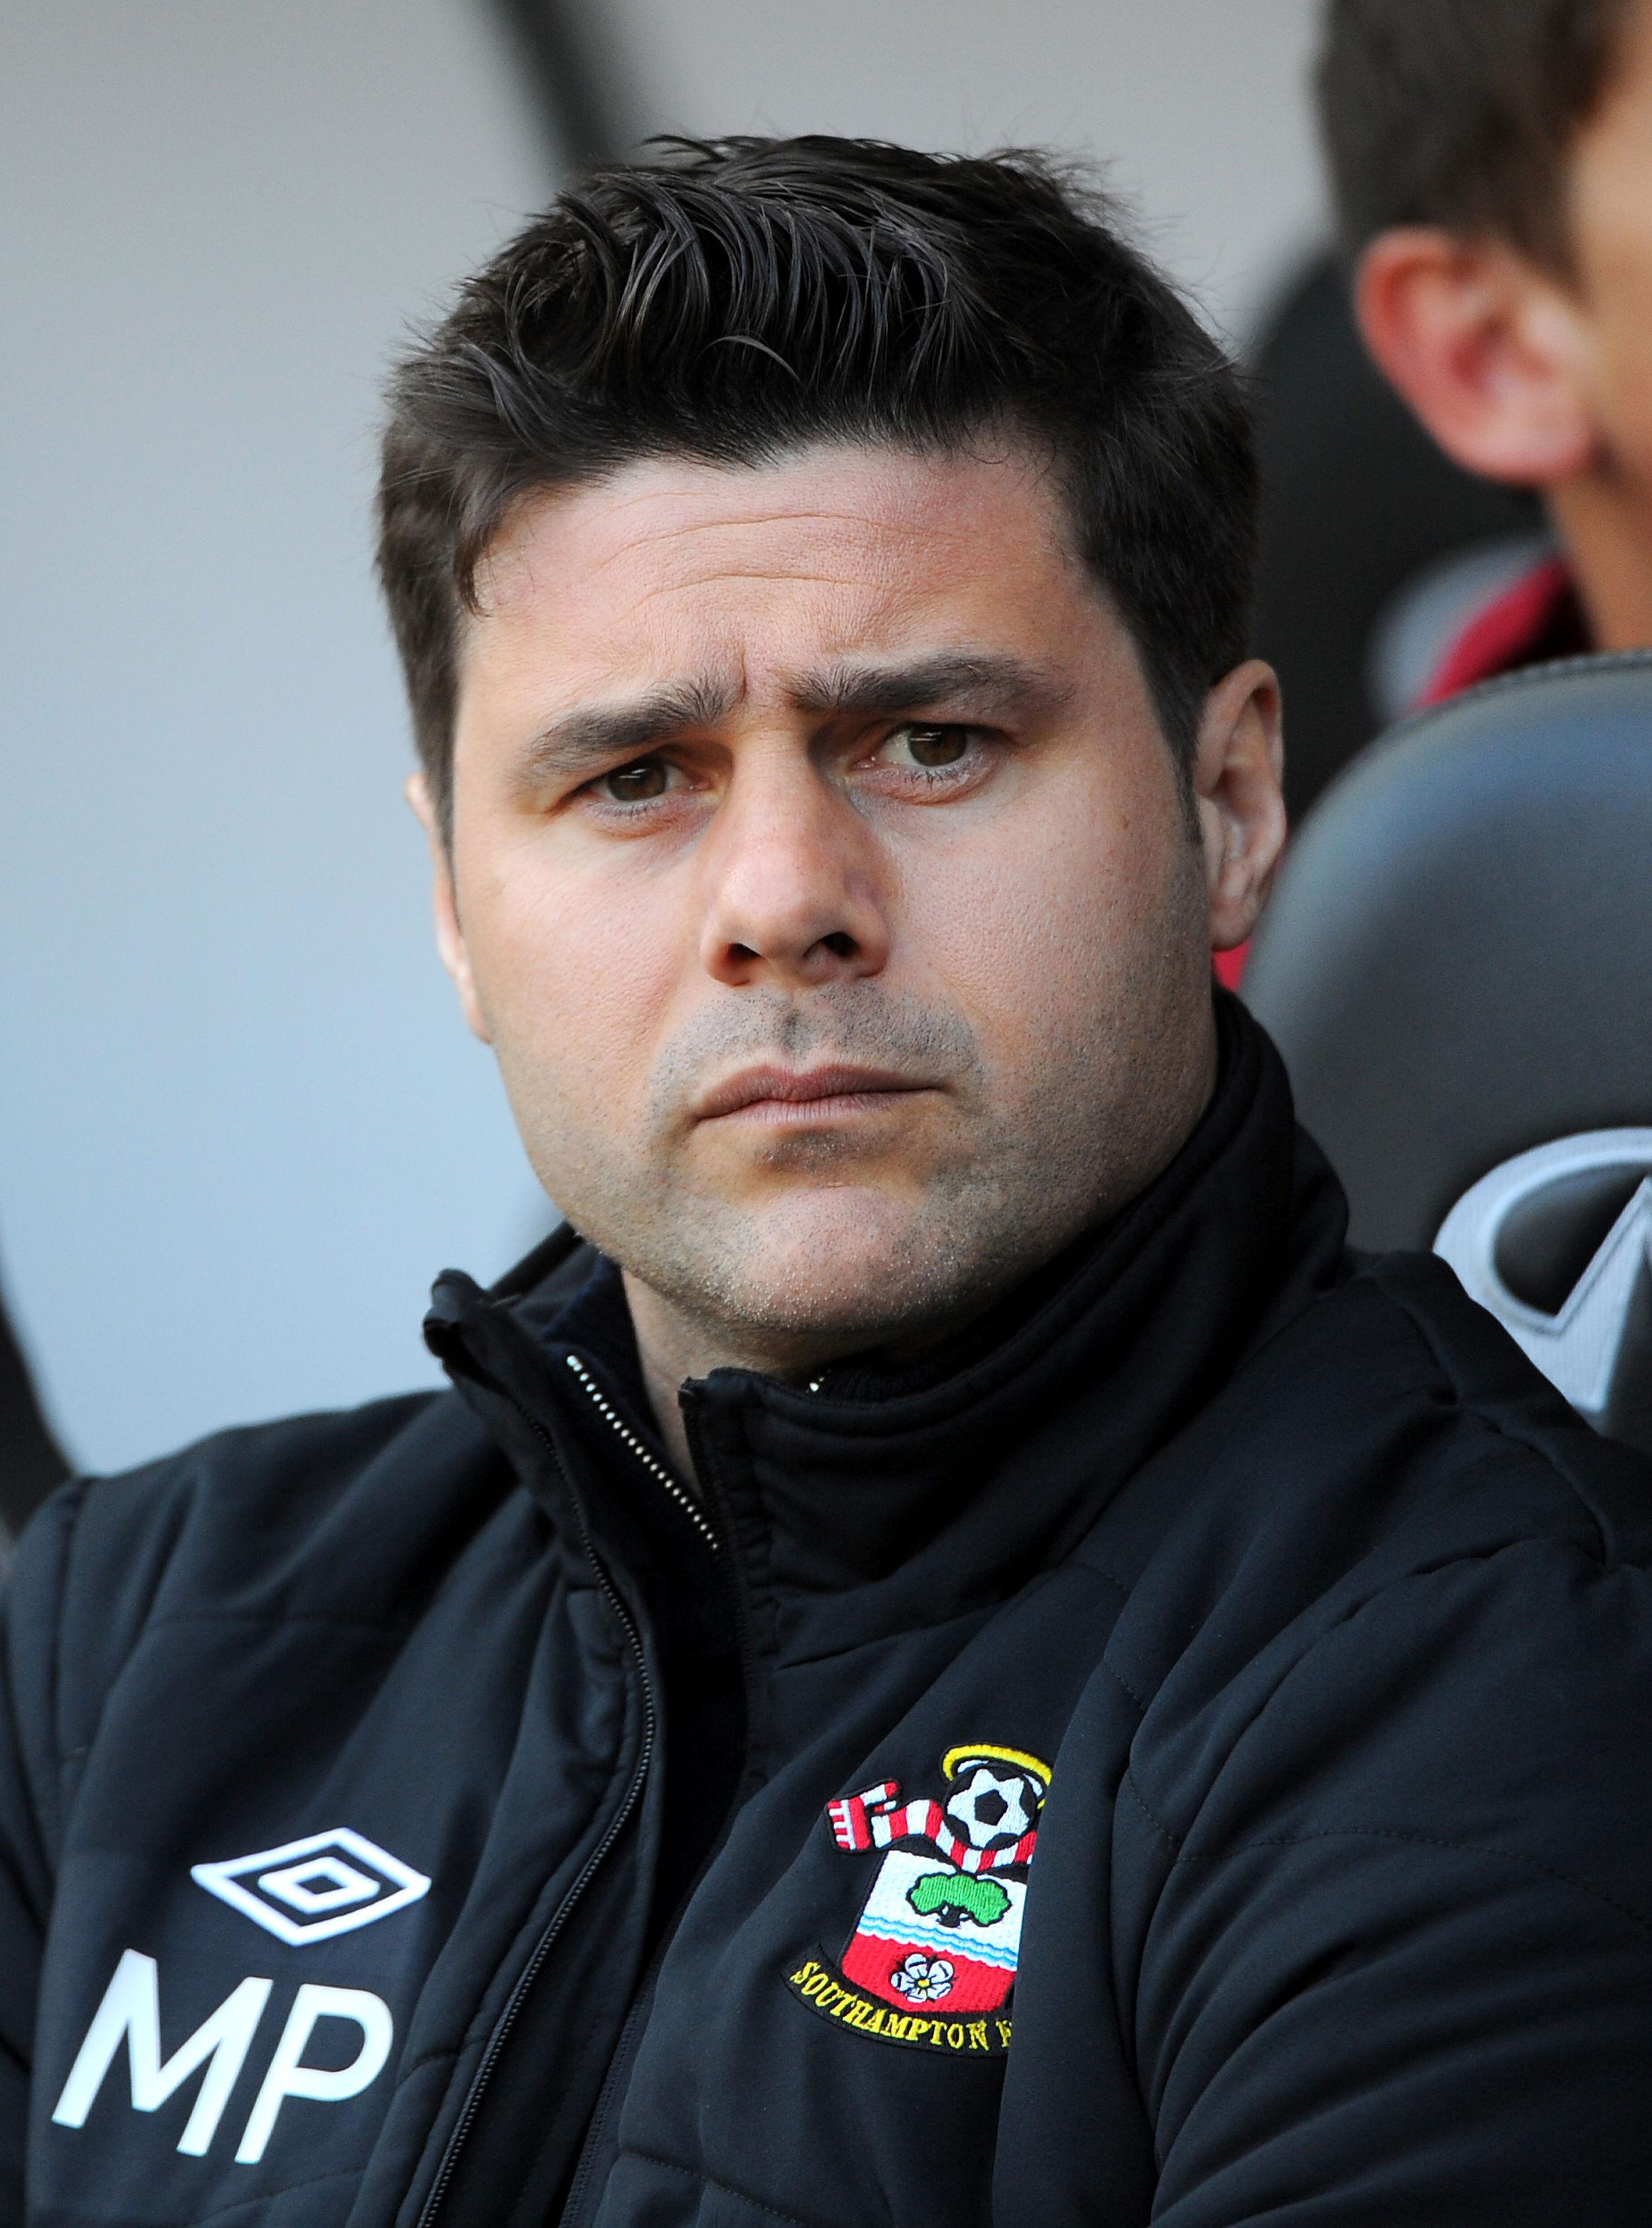 Mauricio Pochettino coach Adam Lallana at Southampton